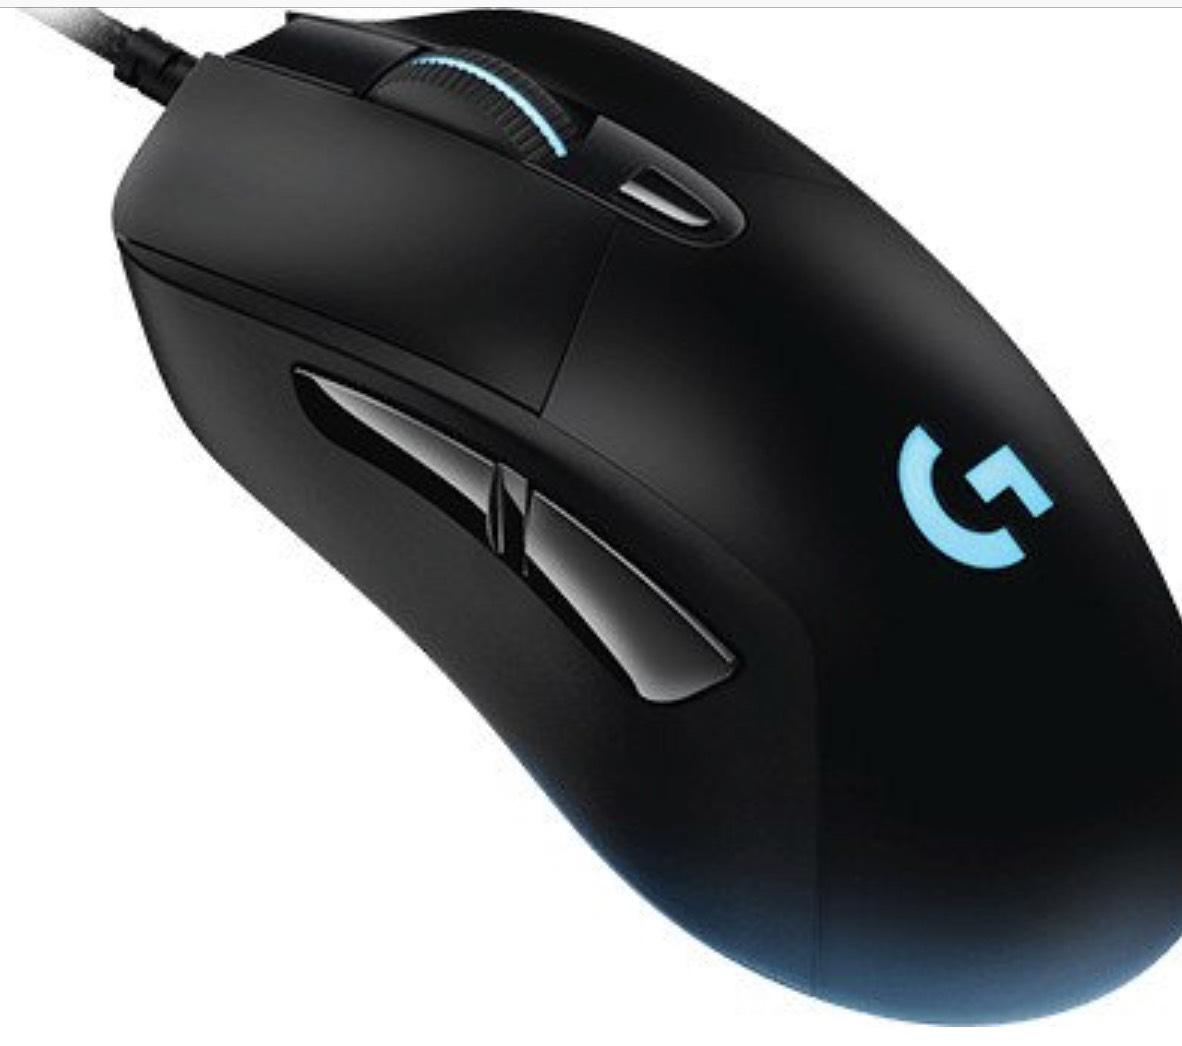 Logitech G403 Prodigy Kabelgebundene Gaming-Maus für 37,30€